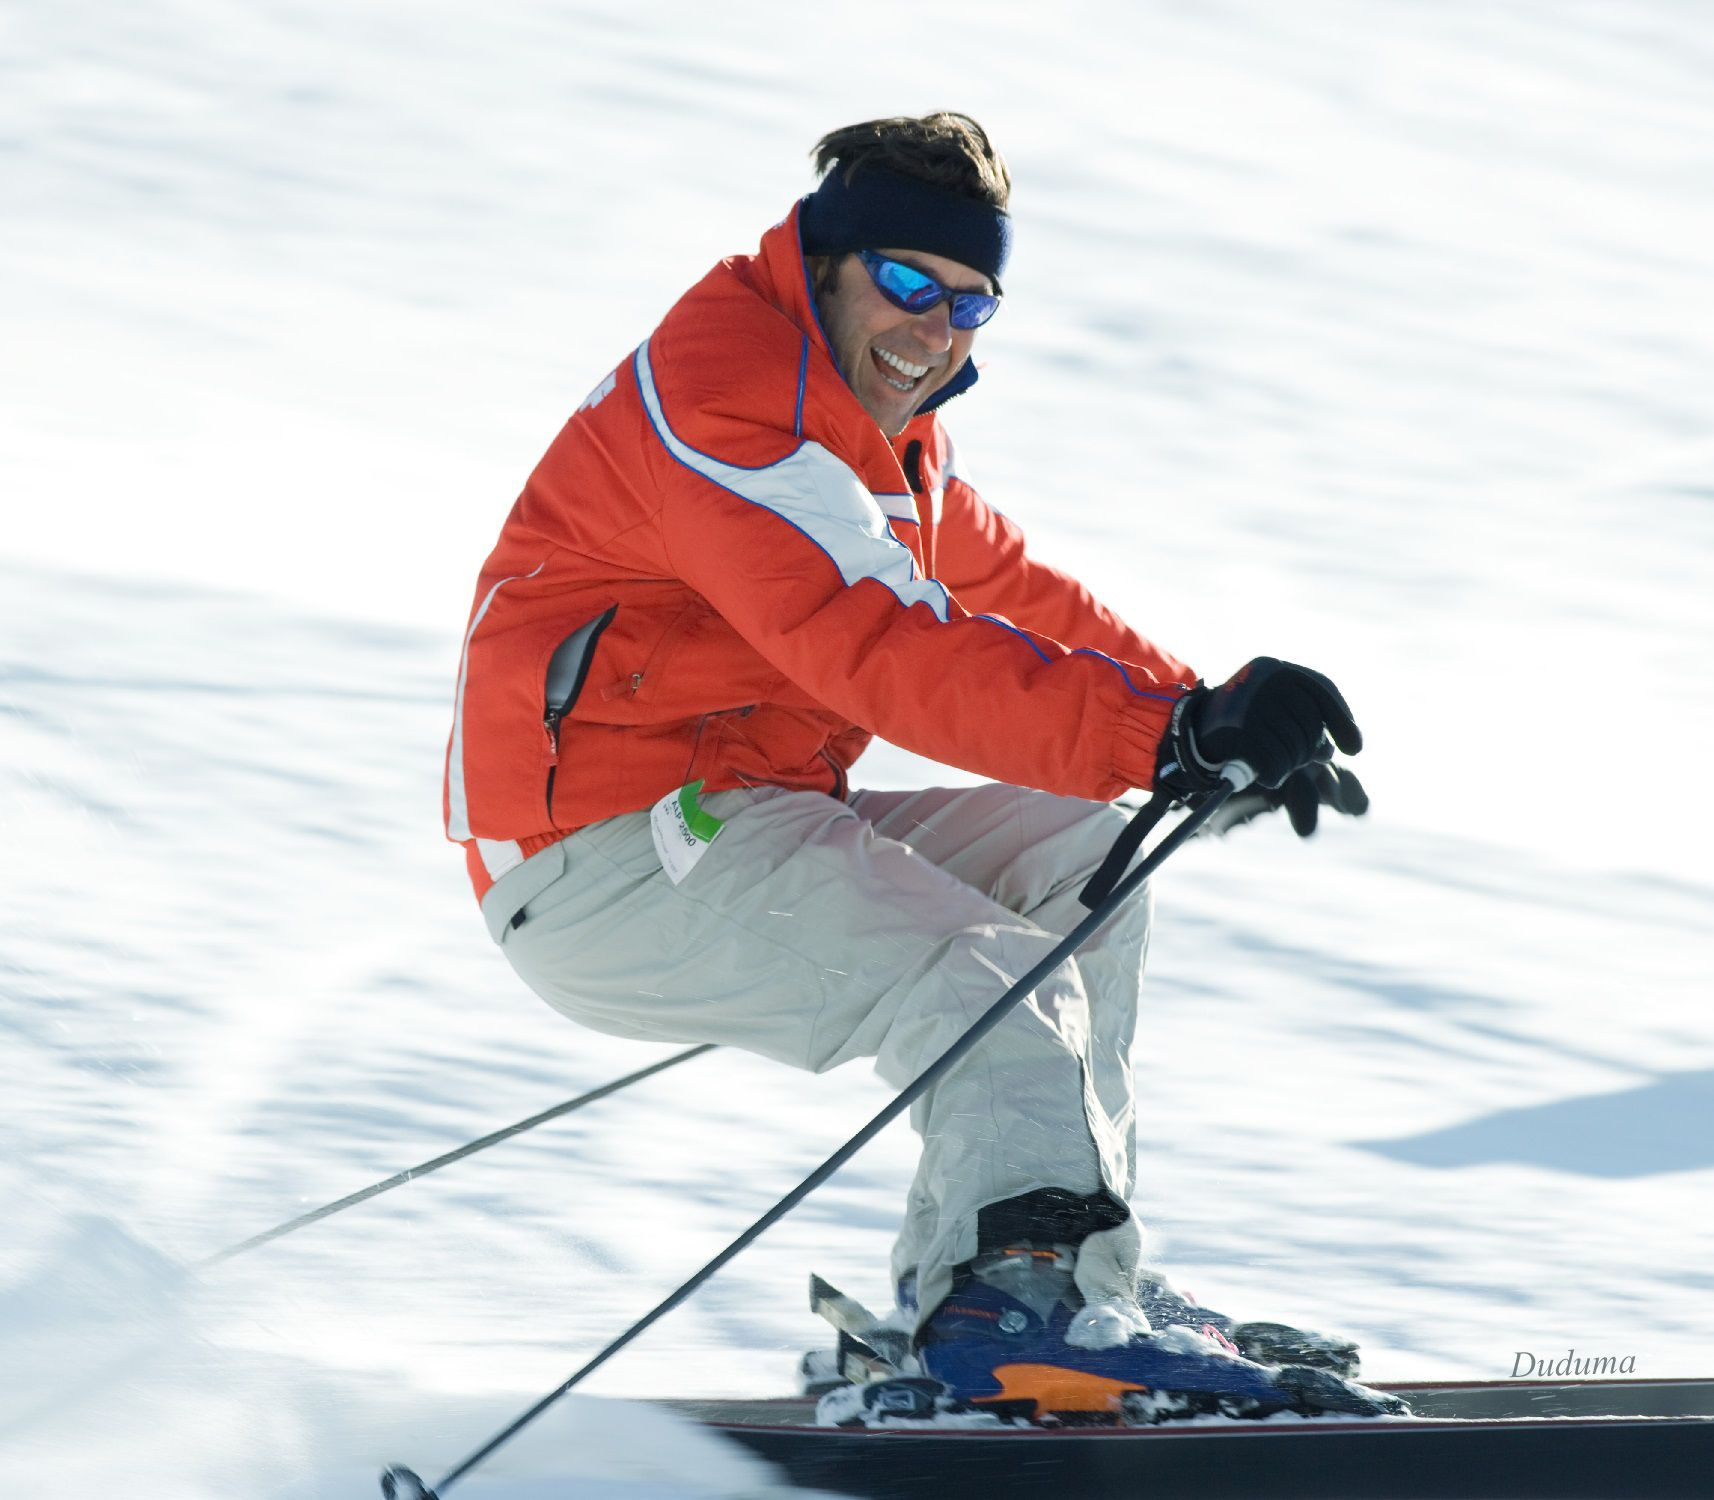 #ski #skiing #snowboard #snowboarding #snow #powder #outdoorresearch #skier #arcteryx #creek #pow #skiresort #tent #esqui #freeski #wintersports #hiker ... & Watch me drifting oh yeah. #Duduma #Sunglasses . . . . . #ski ...